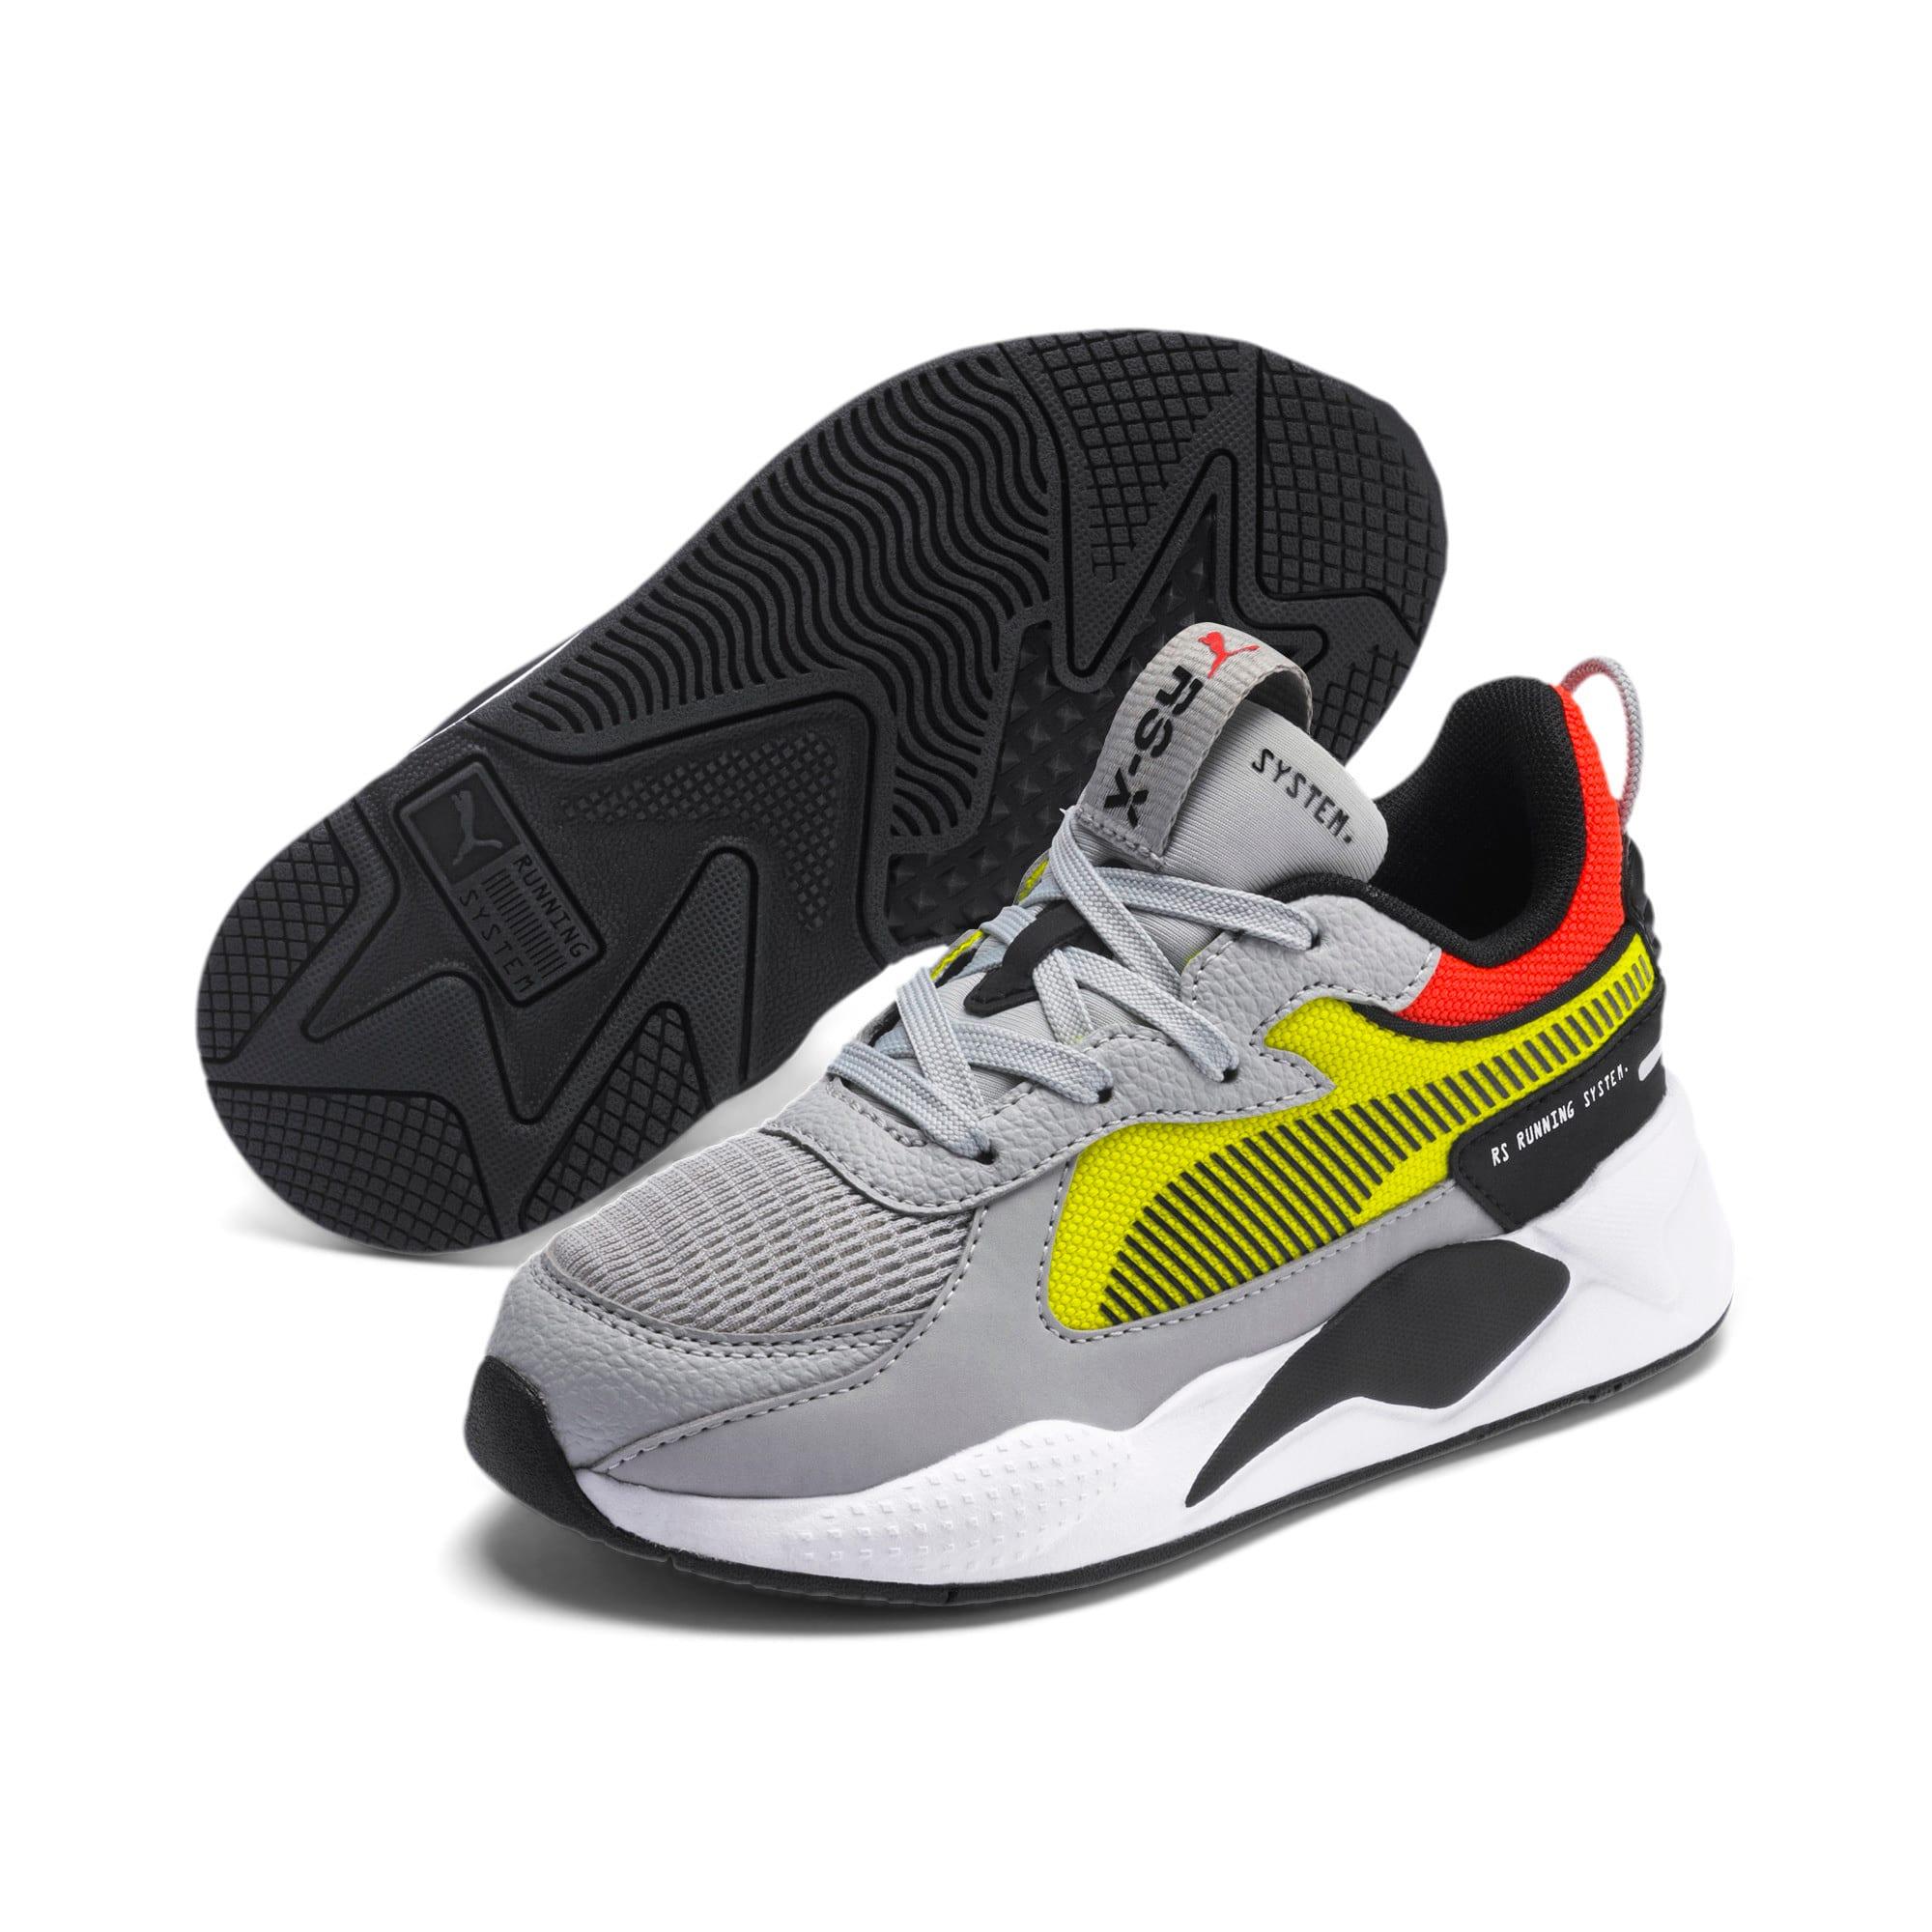 Miniatura 2 de Zapatos RS-X Hard Drive para niño pequeño, High Rise-Yellow Alert, mediano